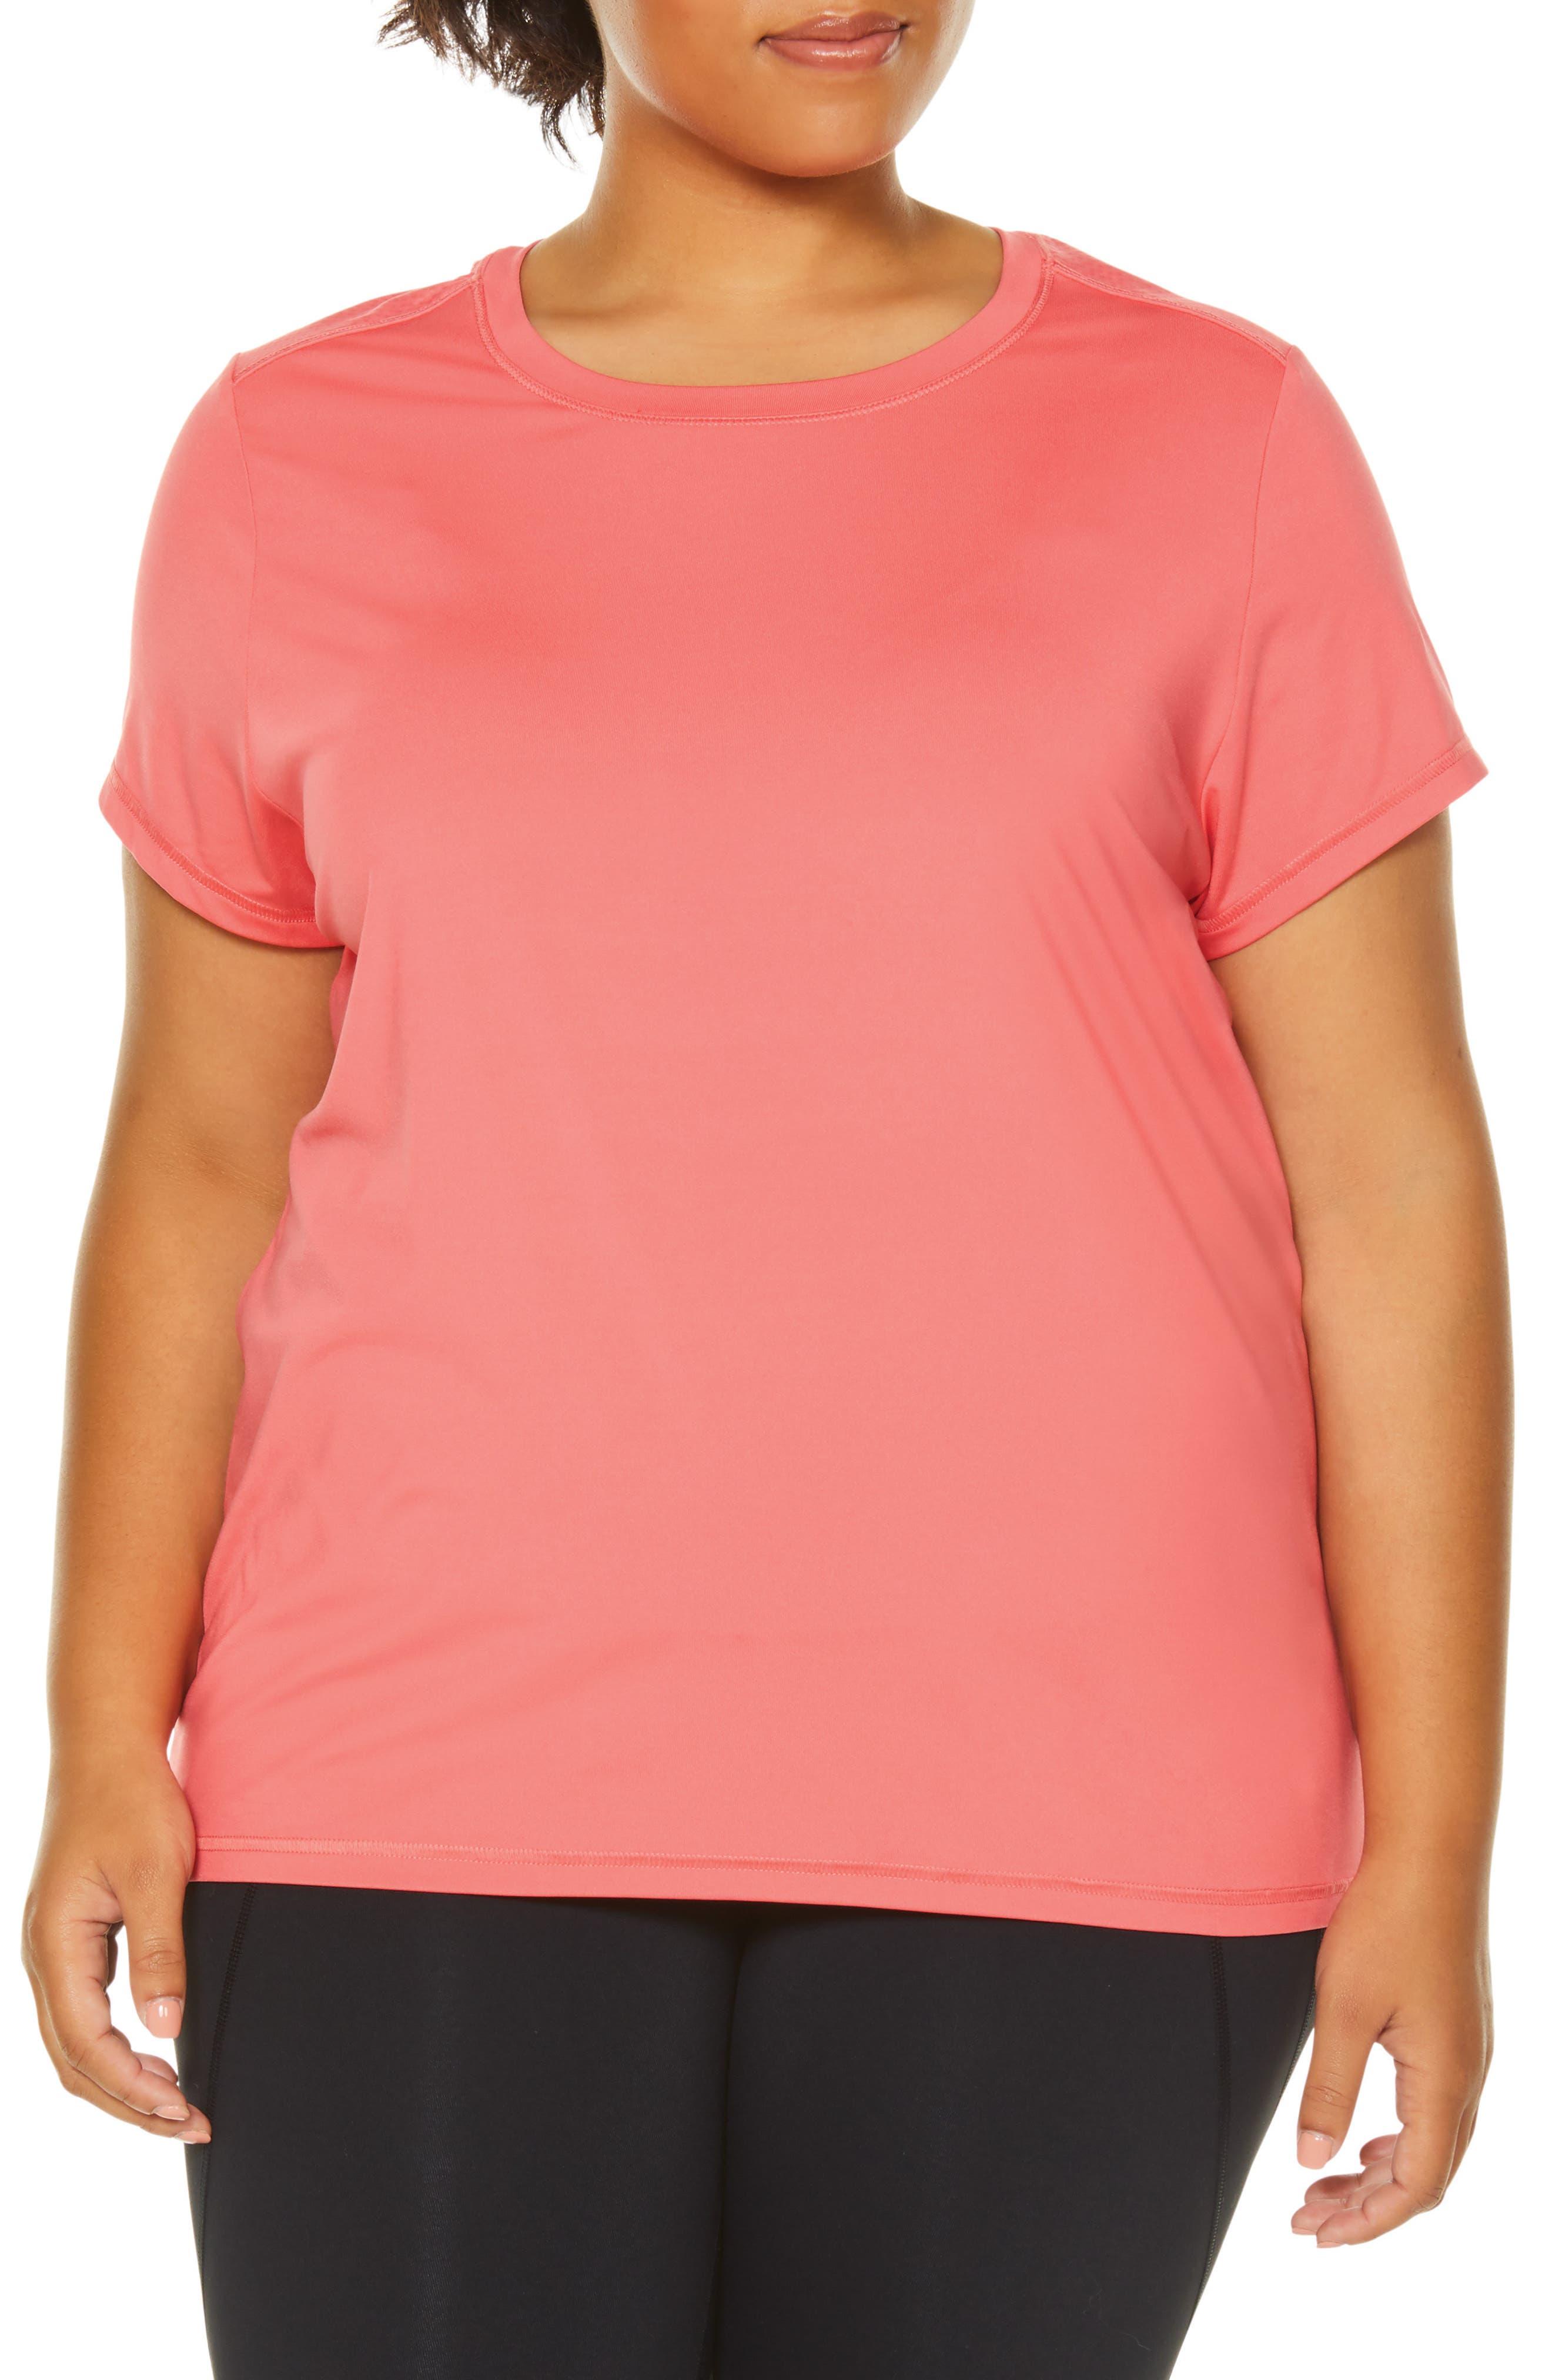 Plus Size Shape Activewear Wishbone Tee, Coral